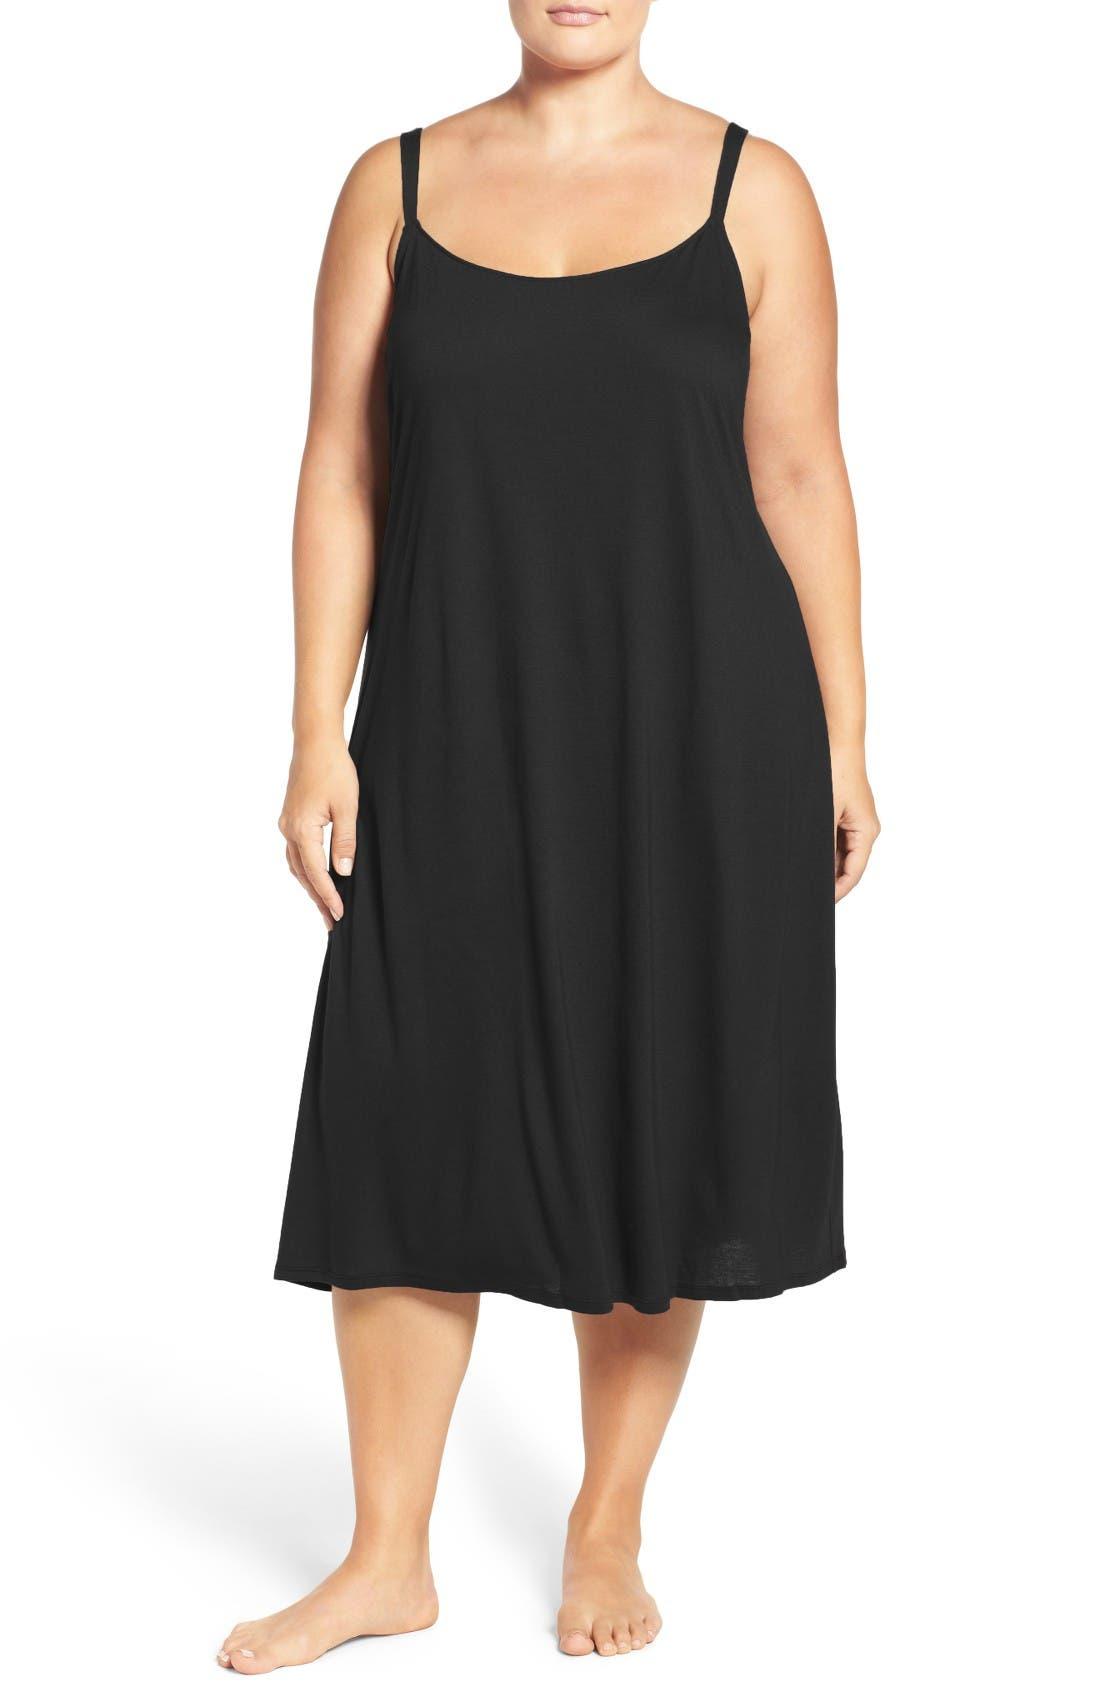 Alternate Image 1 Selected - Natori 'Shangri La' Nightgown (Plus Size)